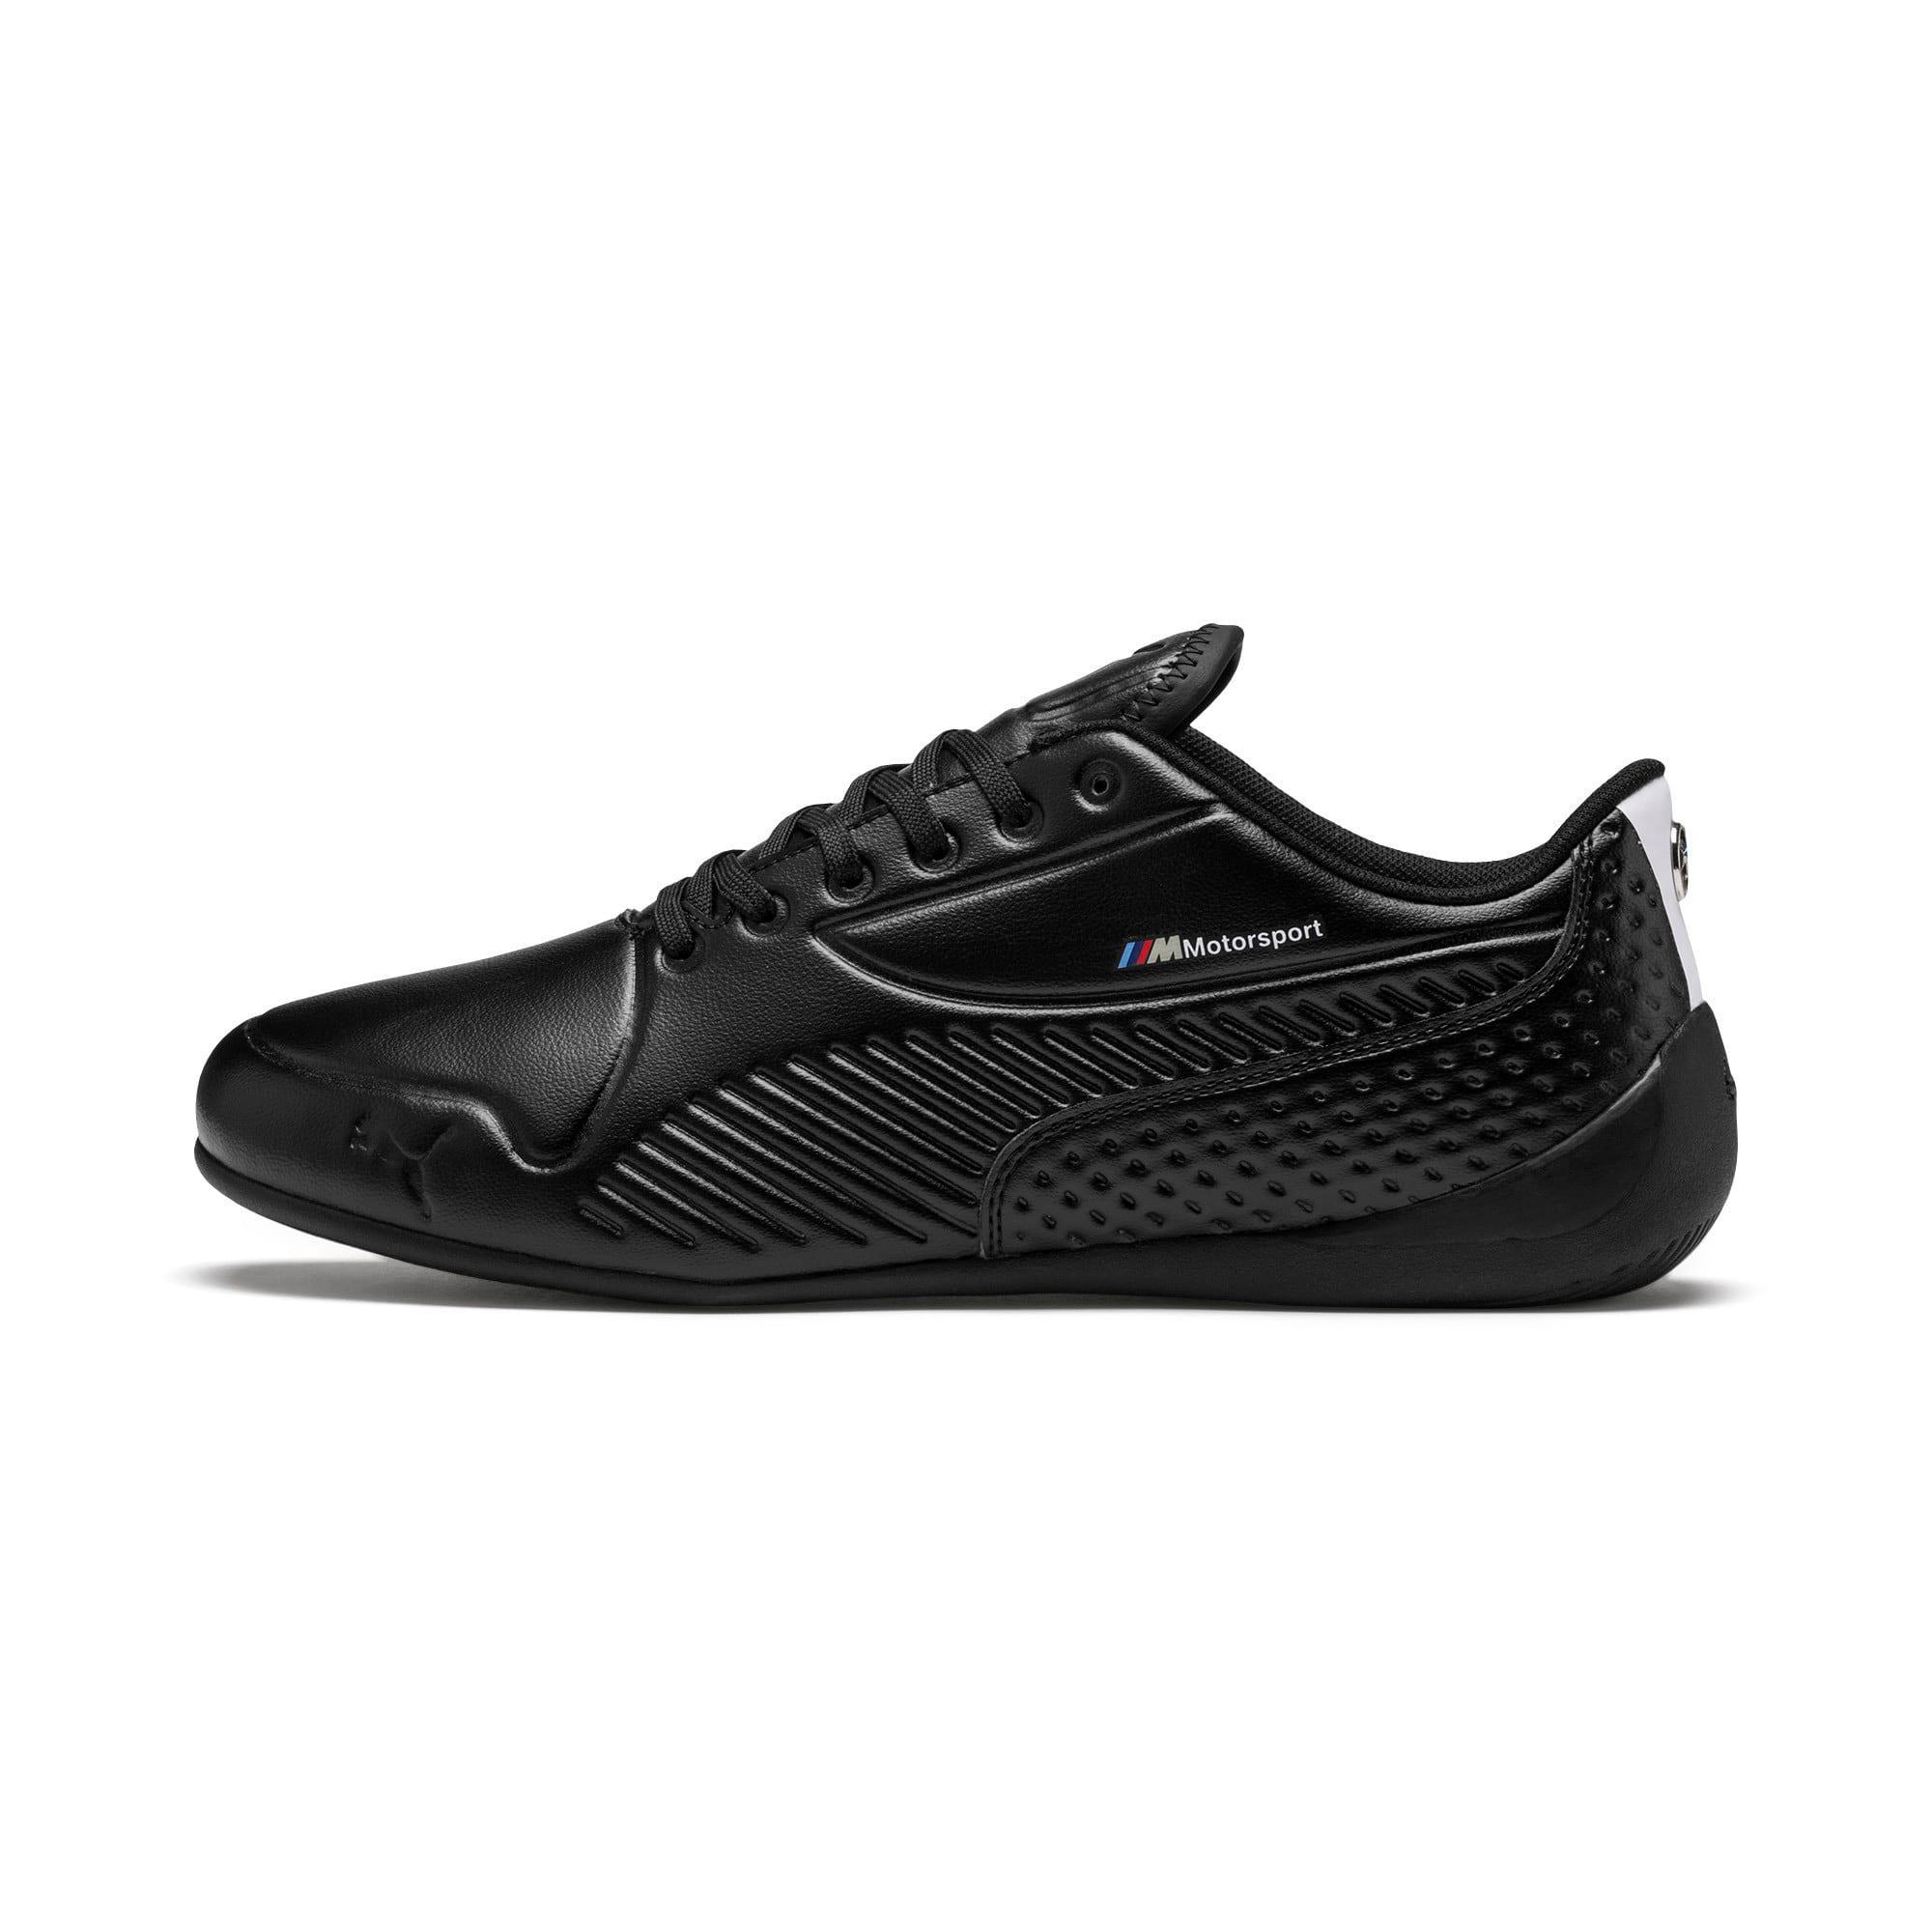 Thumbnail 1 of BMW M Motorsport Drift Cat 7S Ultra Shoes, Puma Black-Puma White, medium